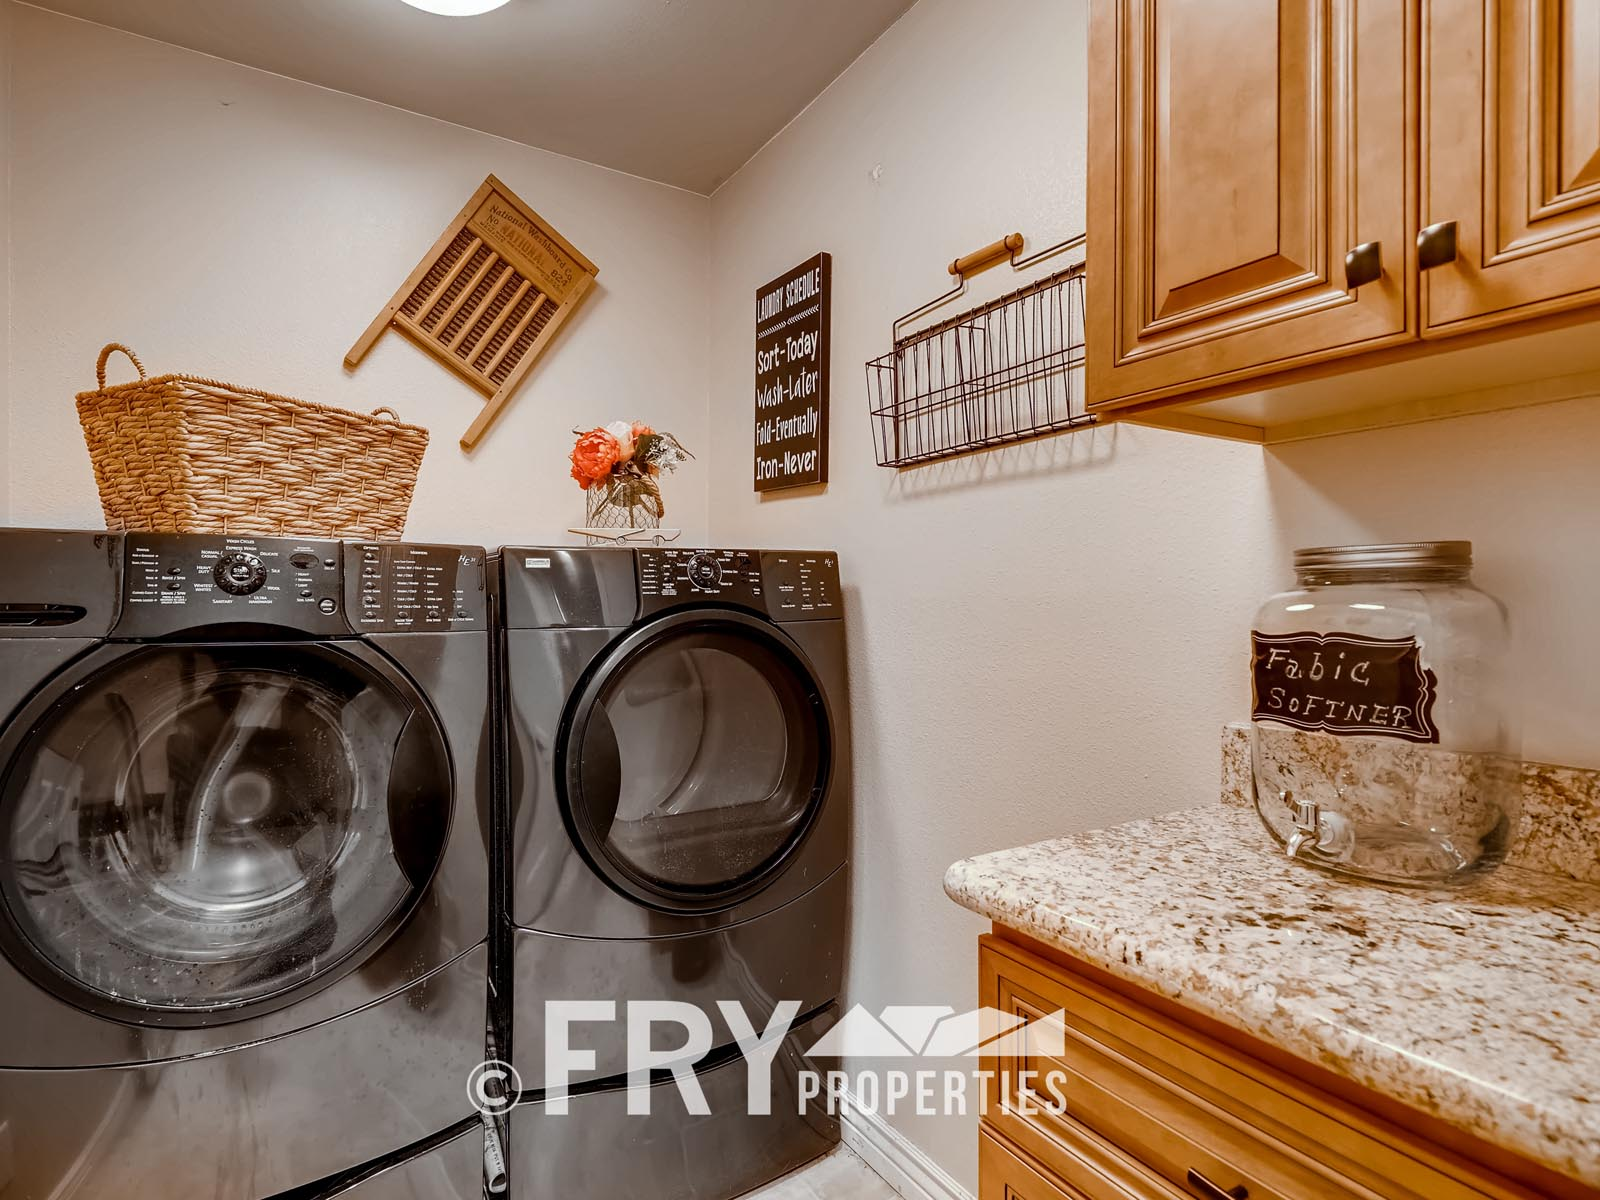 6305 W 6th Ave Unit A6-print-024-19-Lower Level Laundry Room-3600x2400-300dpi